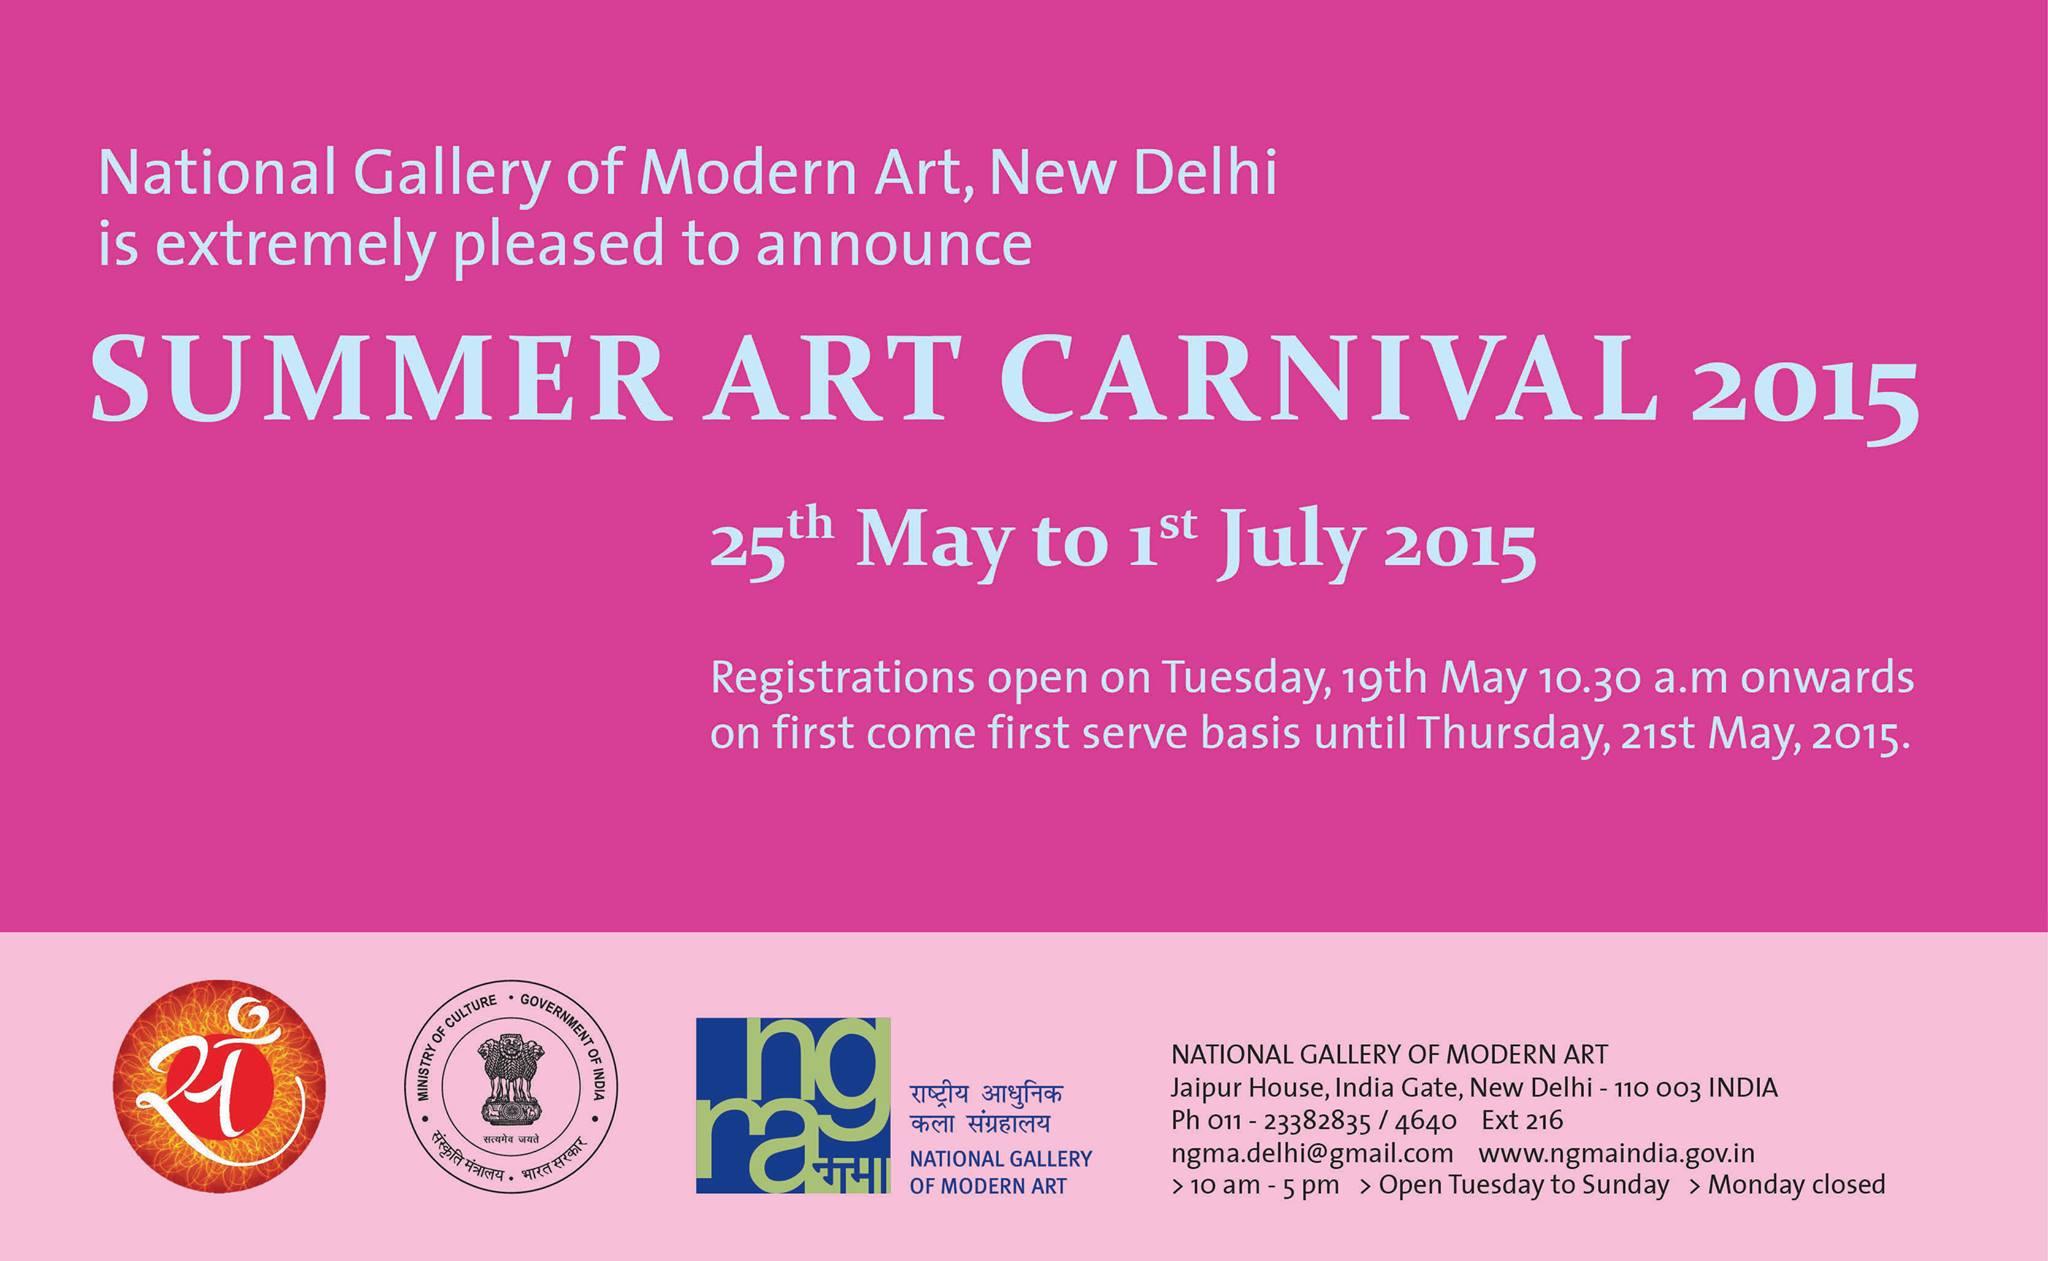 NGMA SUMMER ART CARNIVAL 2015